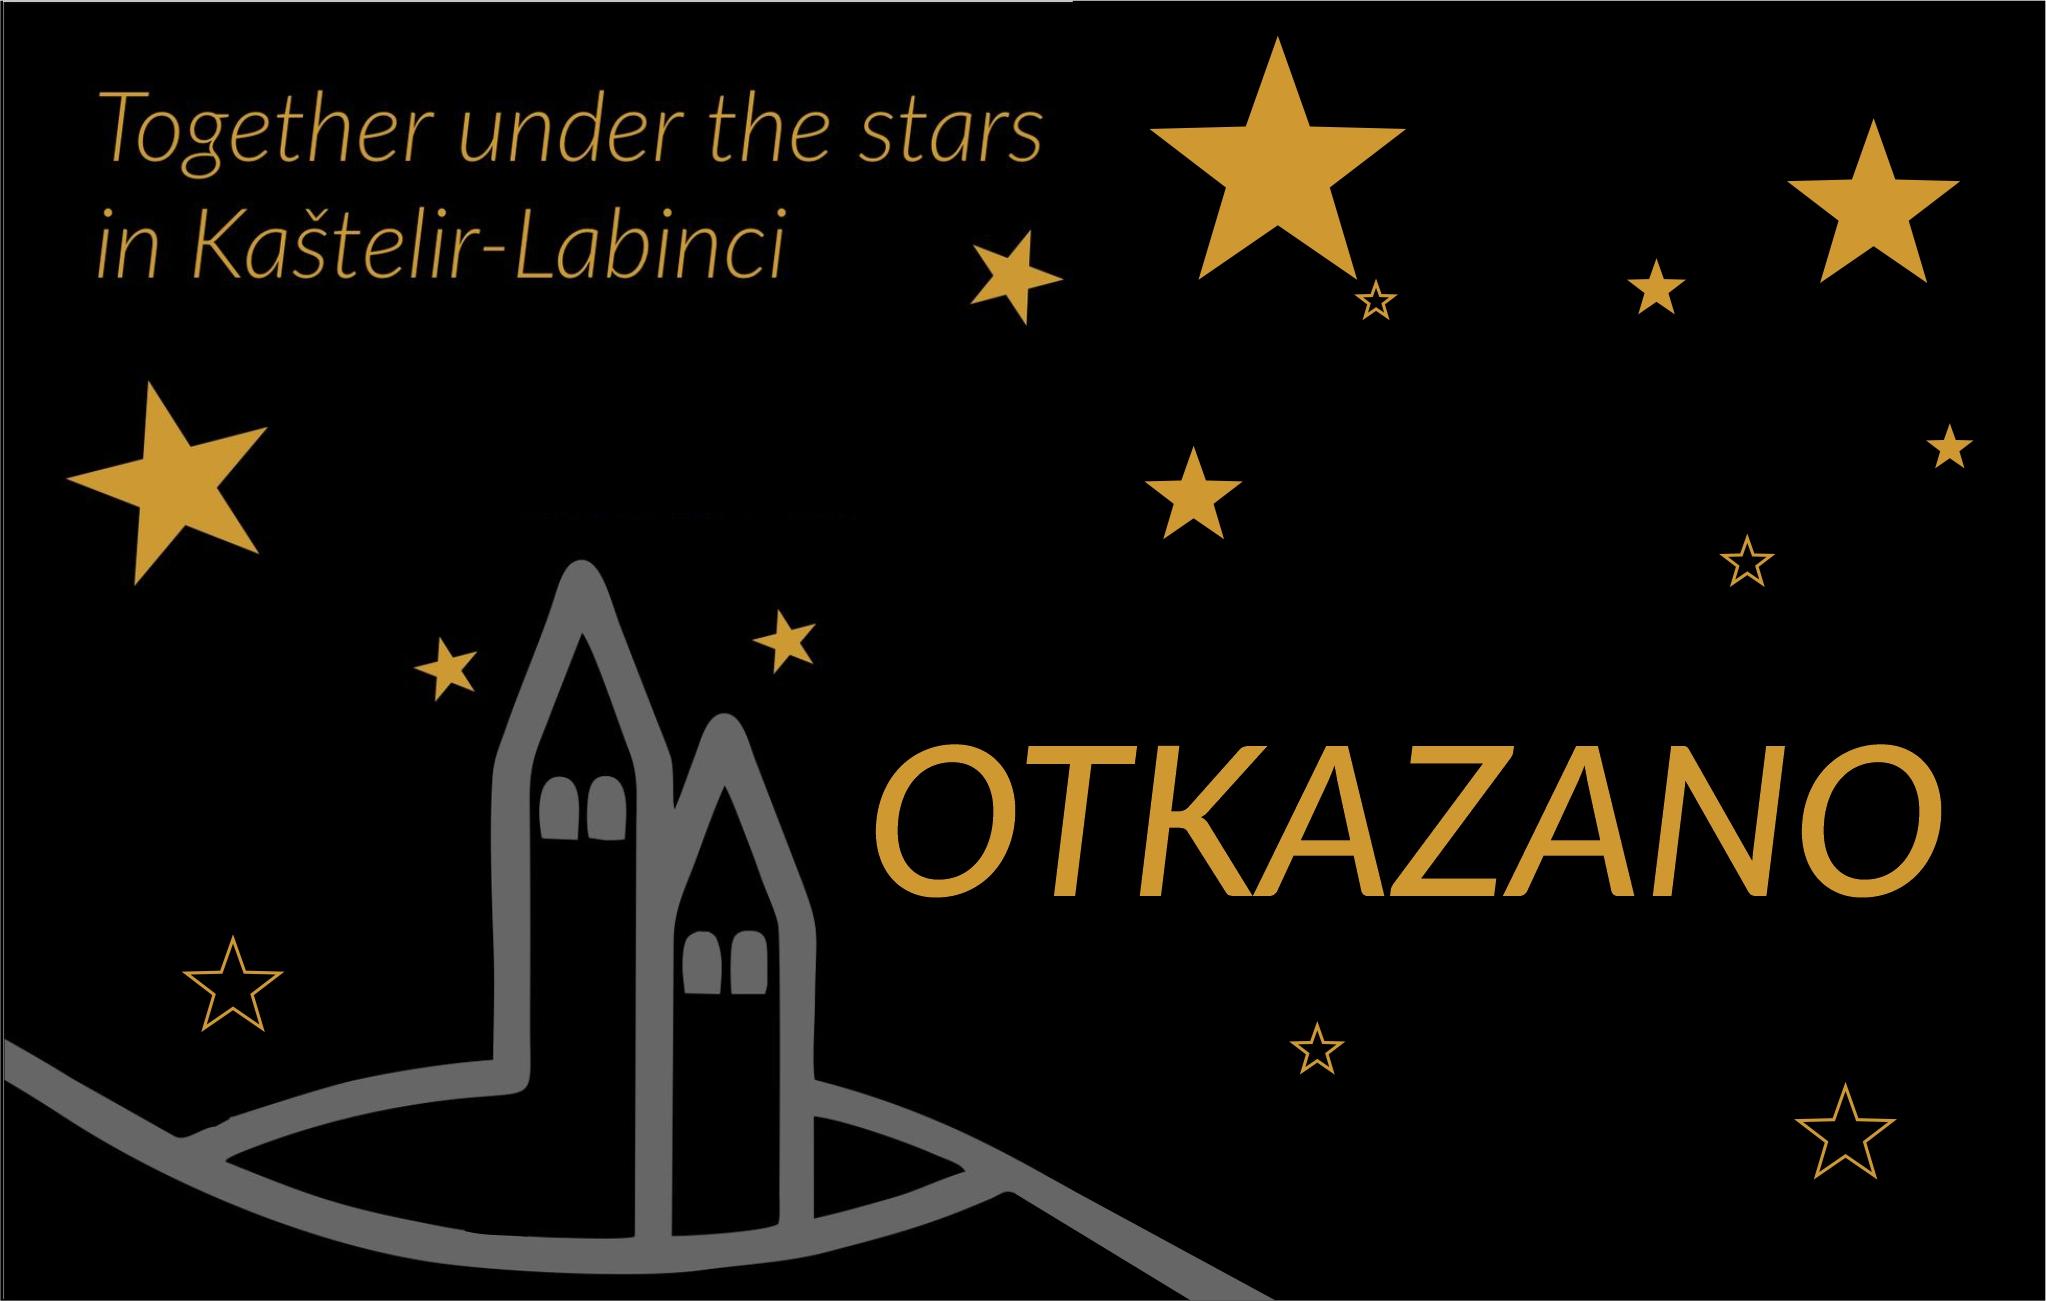 OTKAZANO -Together under the stars in Kaštelir-Labinci